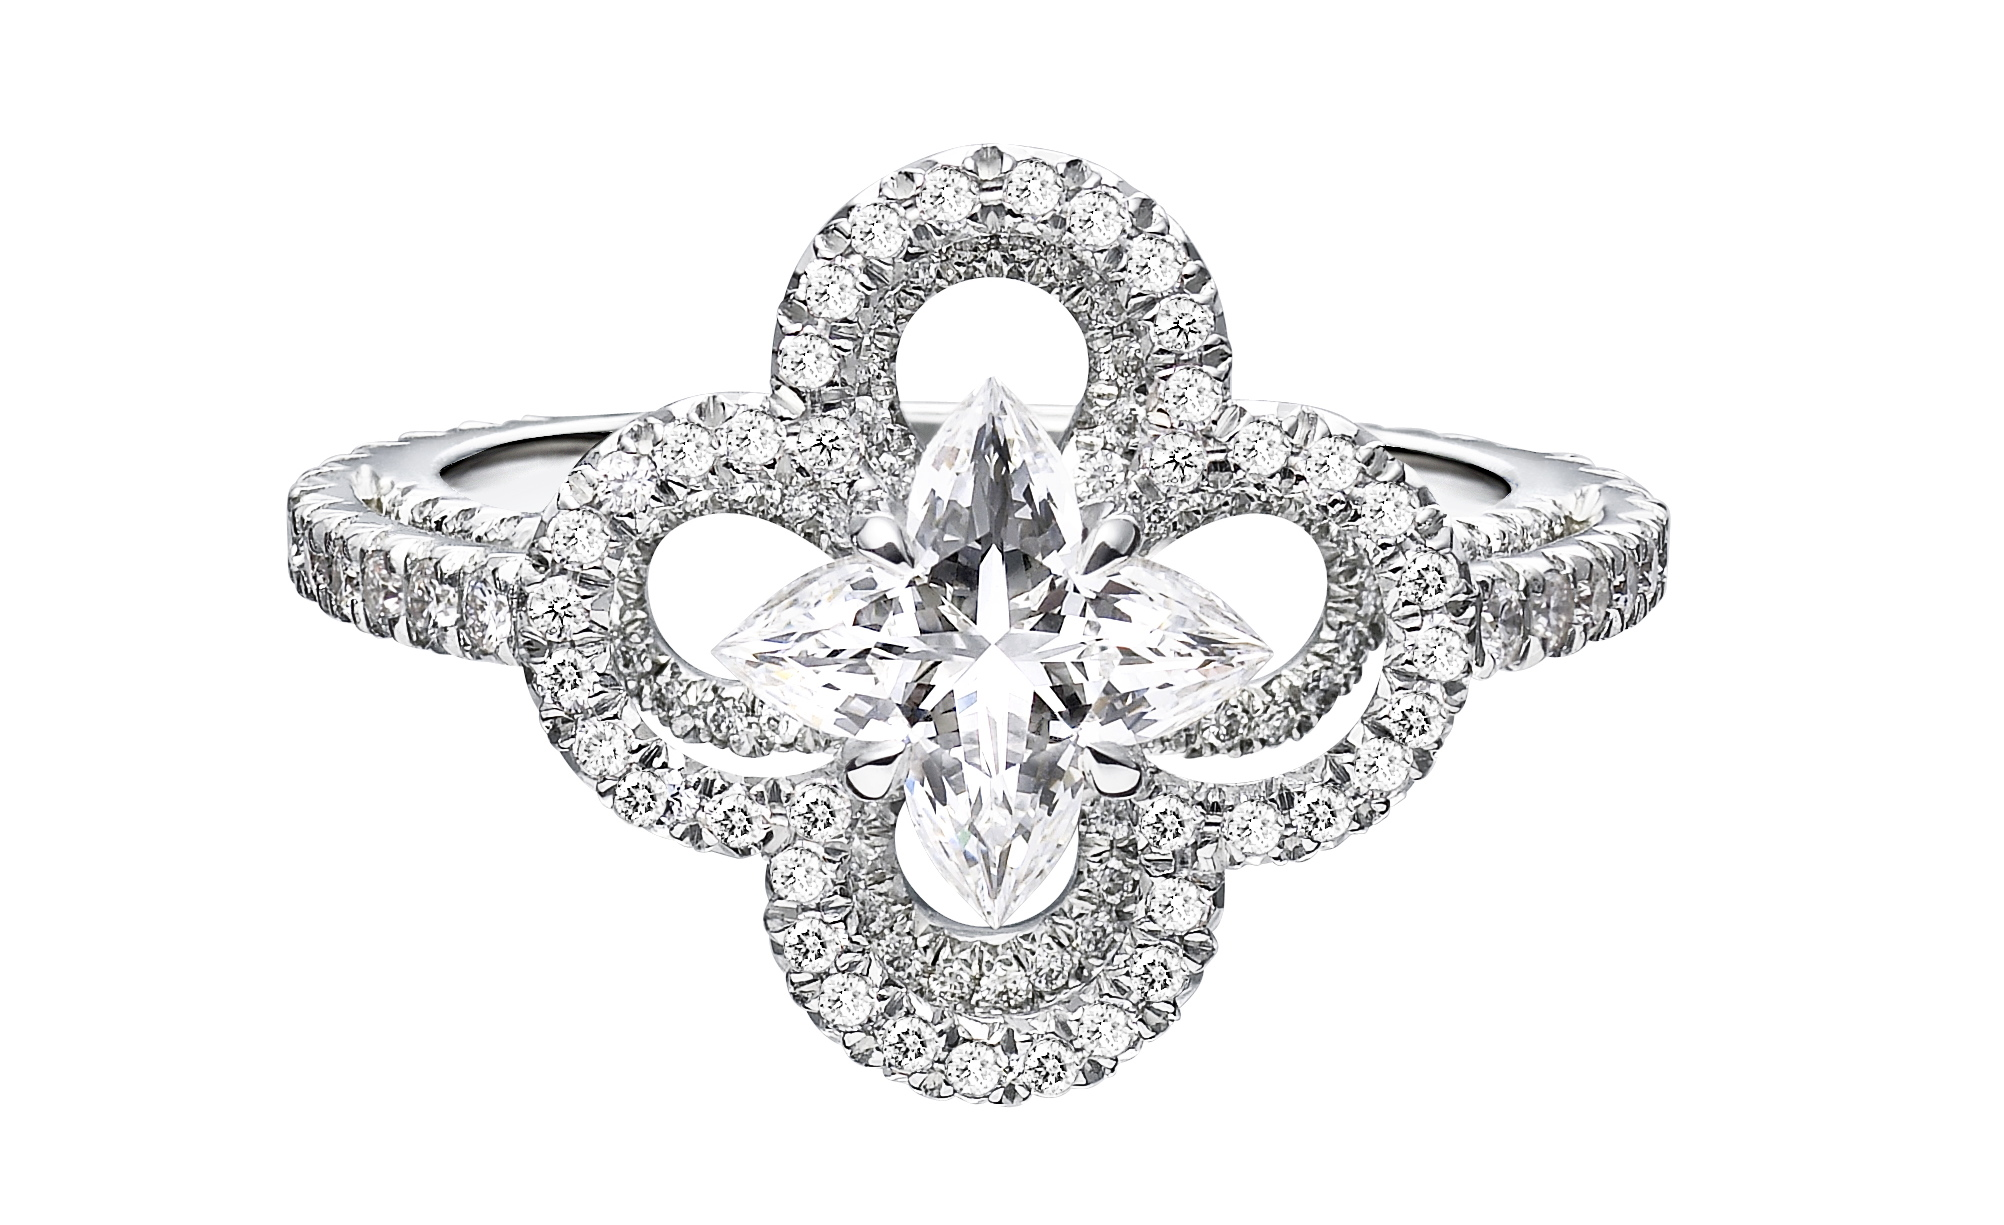 Louis Vuitton diamond cut